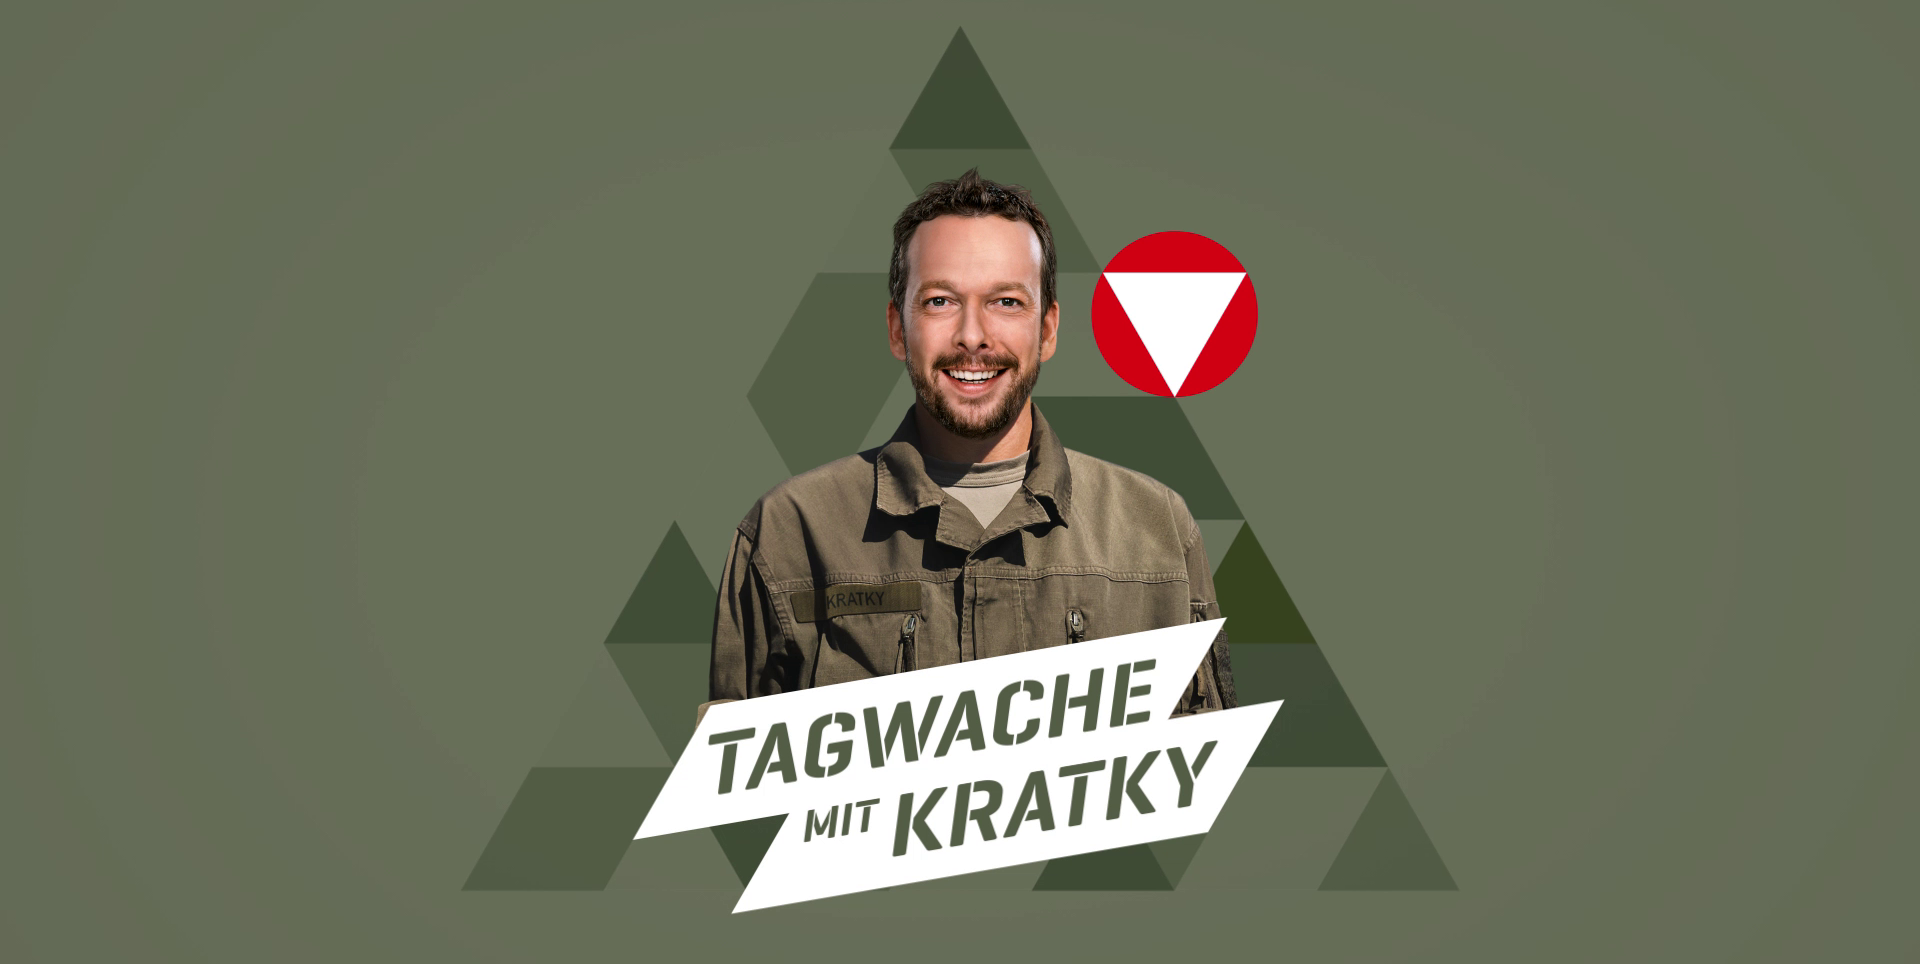 Tagwache mit Kratky © Bundesheer